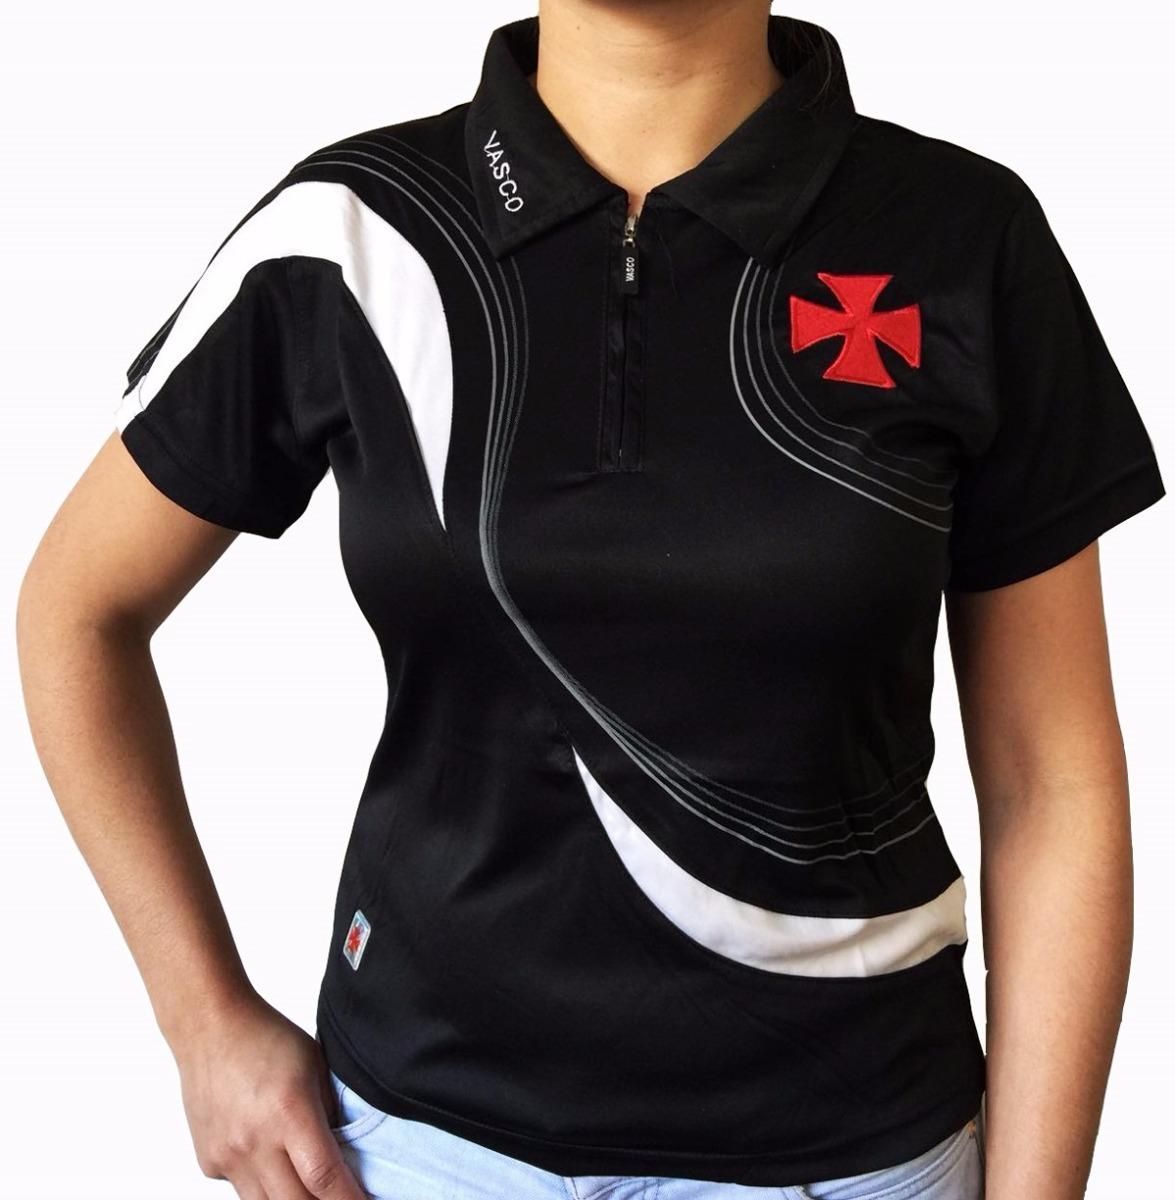 babylook vasco feminina torcedora camiseta preta. Carregando zoom. 9612ce47cc6ca